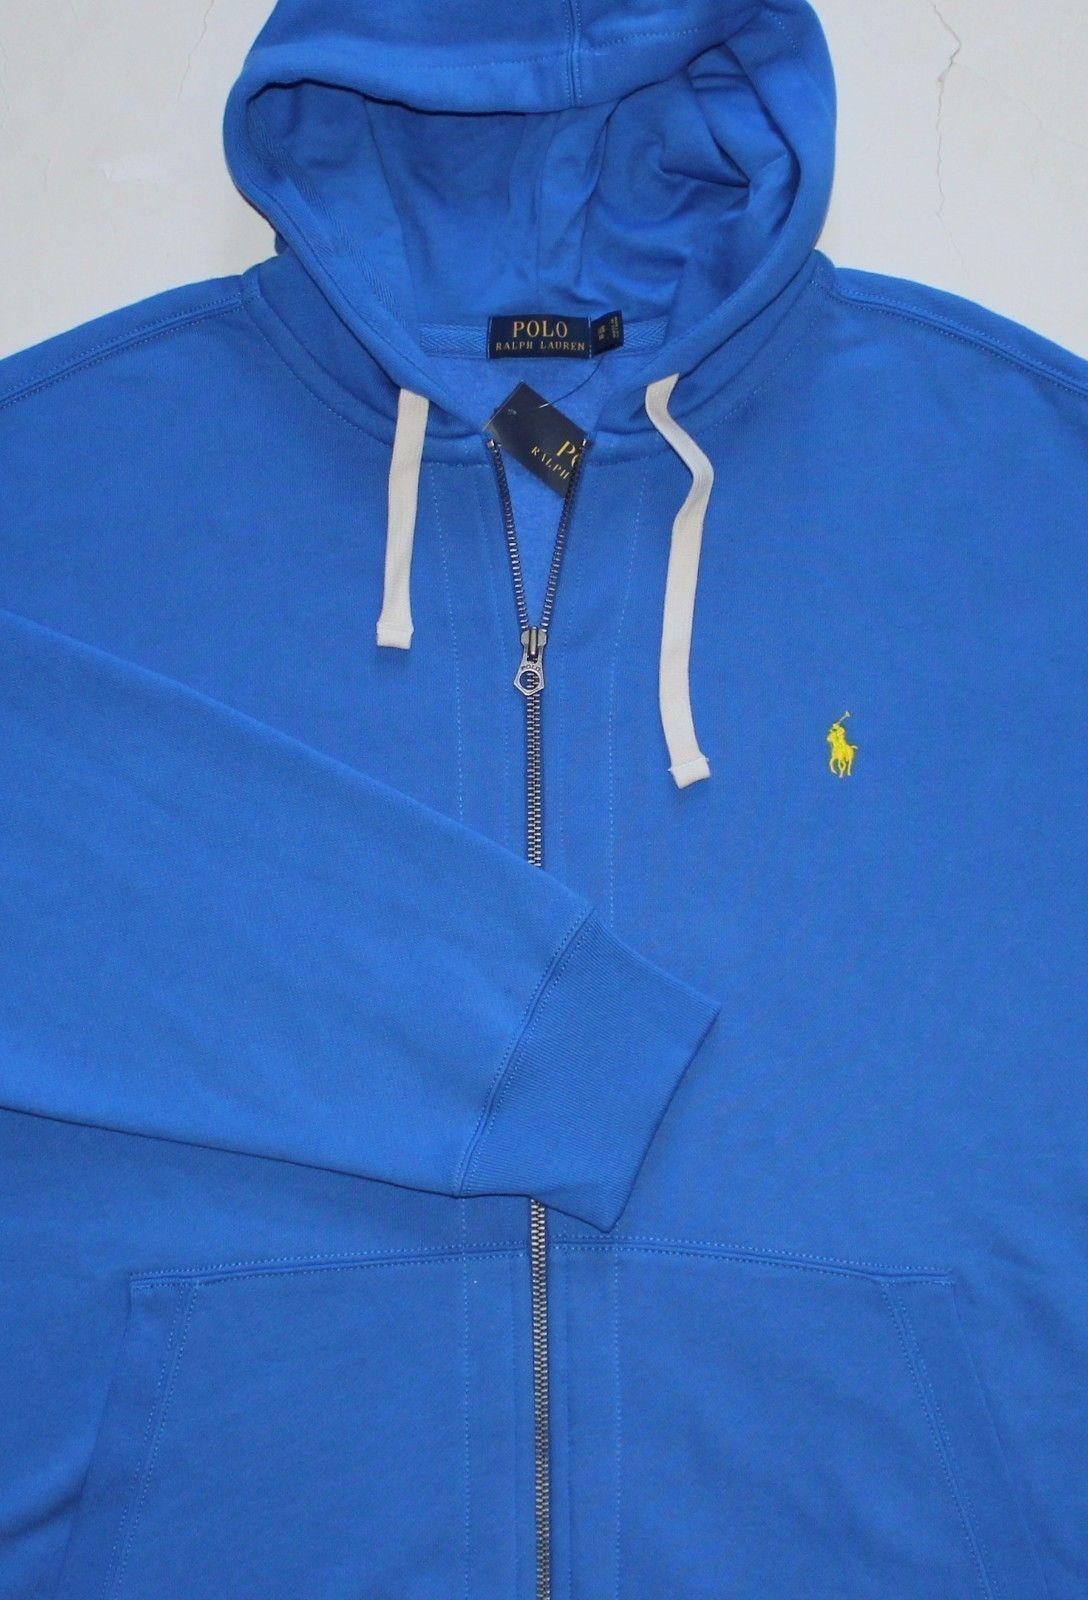 Neu Polo Ralph Lauren Blau Kapuzenpullover mit Reißverschluss / Groß 2x